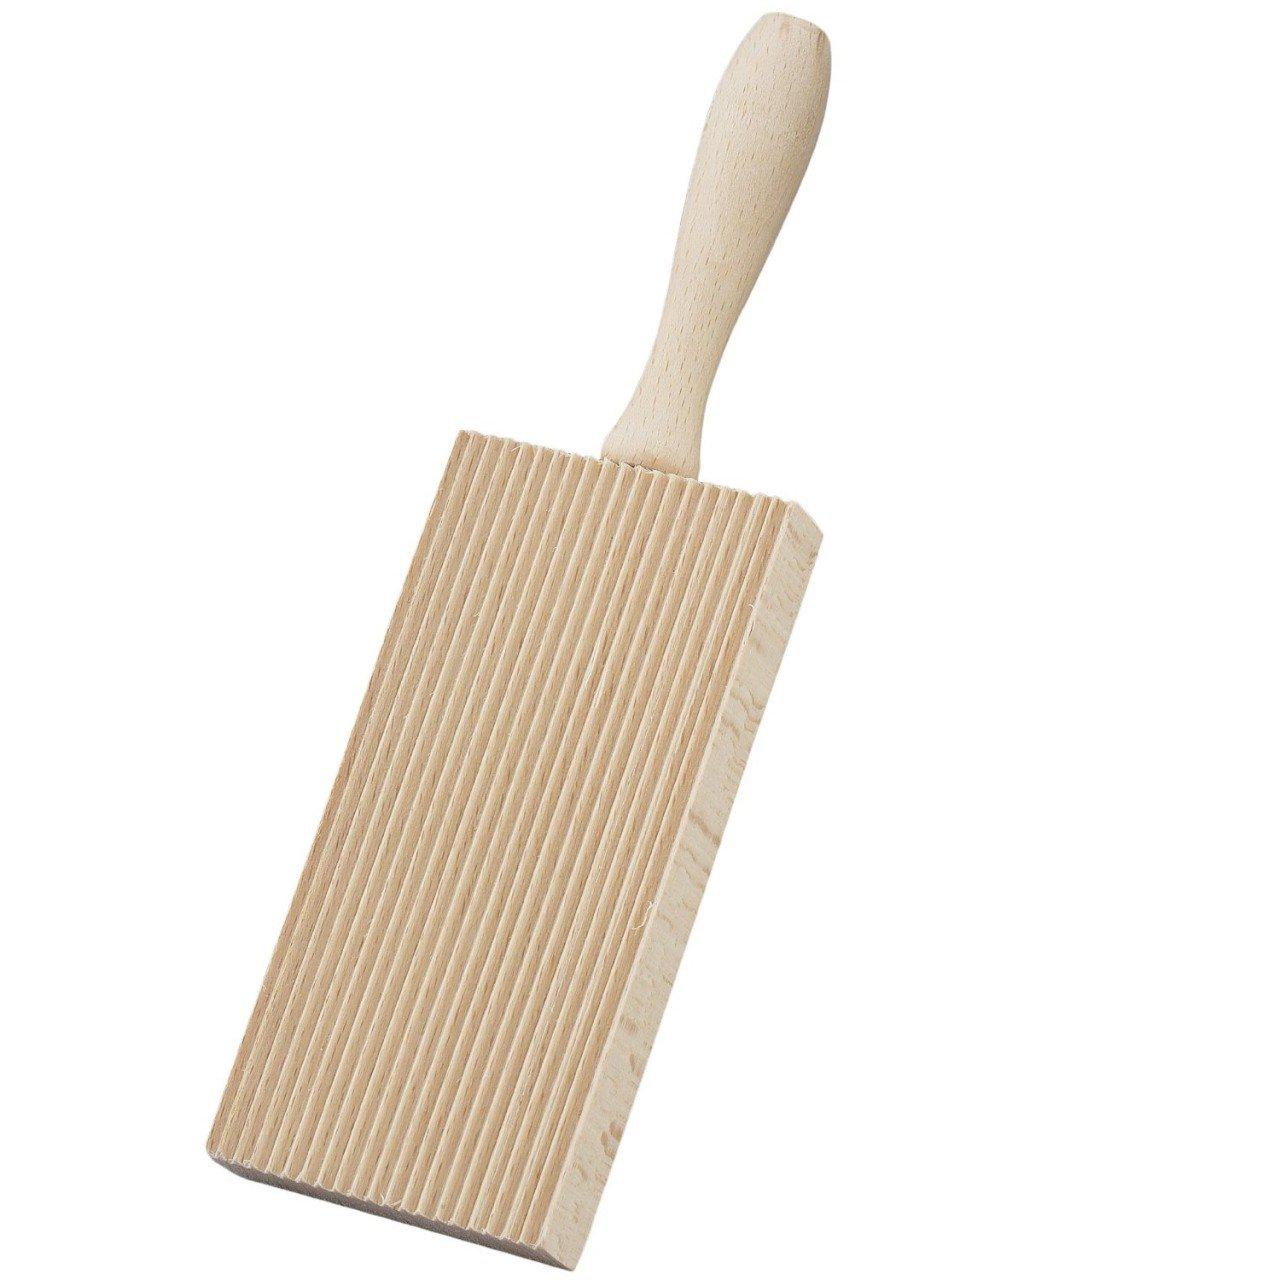 Cuisinox Gnocchi and Cavatelli Board, Wood